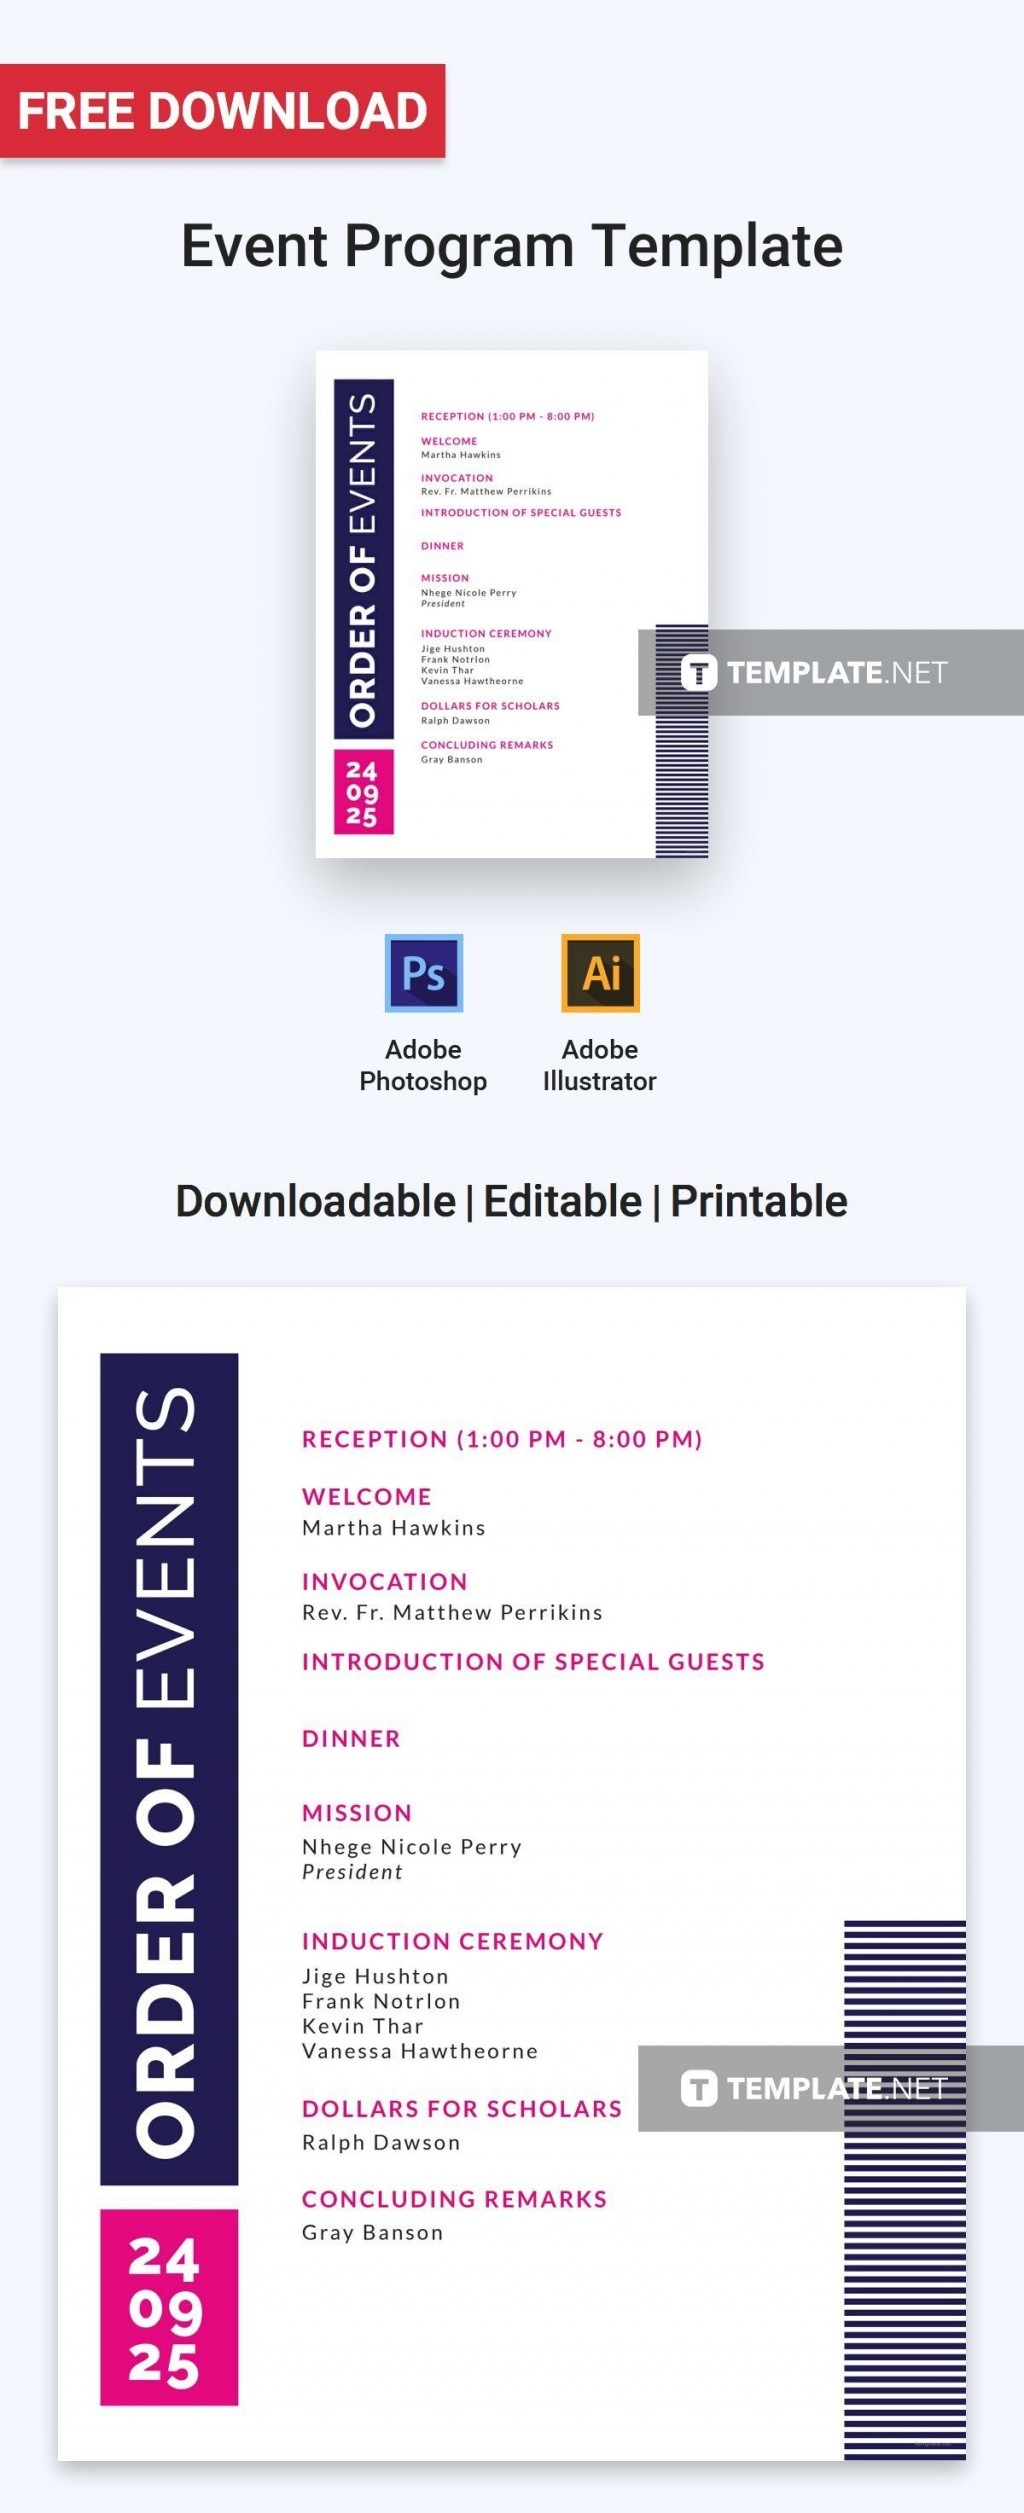 005 Unbelievable Printable Event Program Template High Definition  Free DownloadLarge